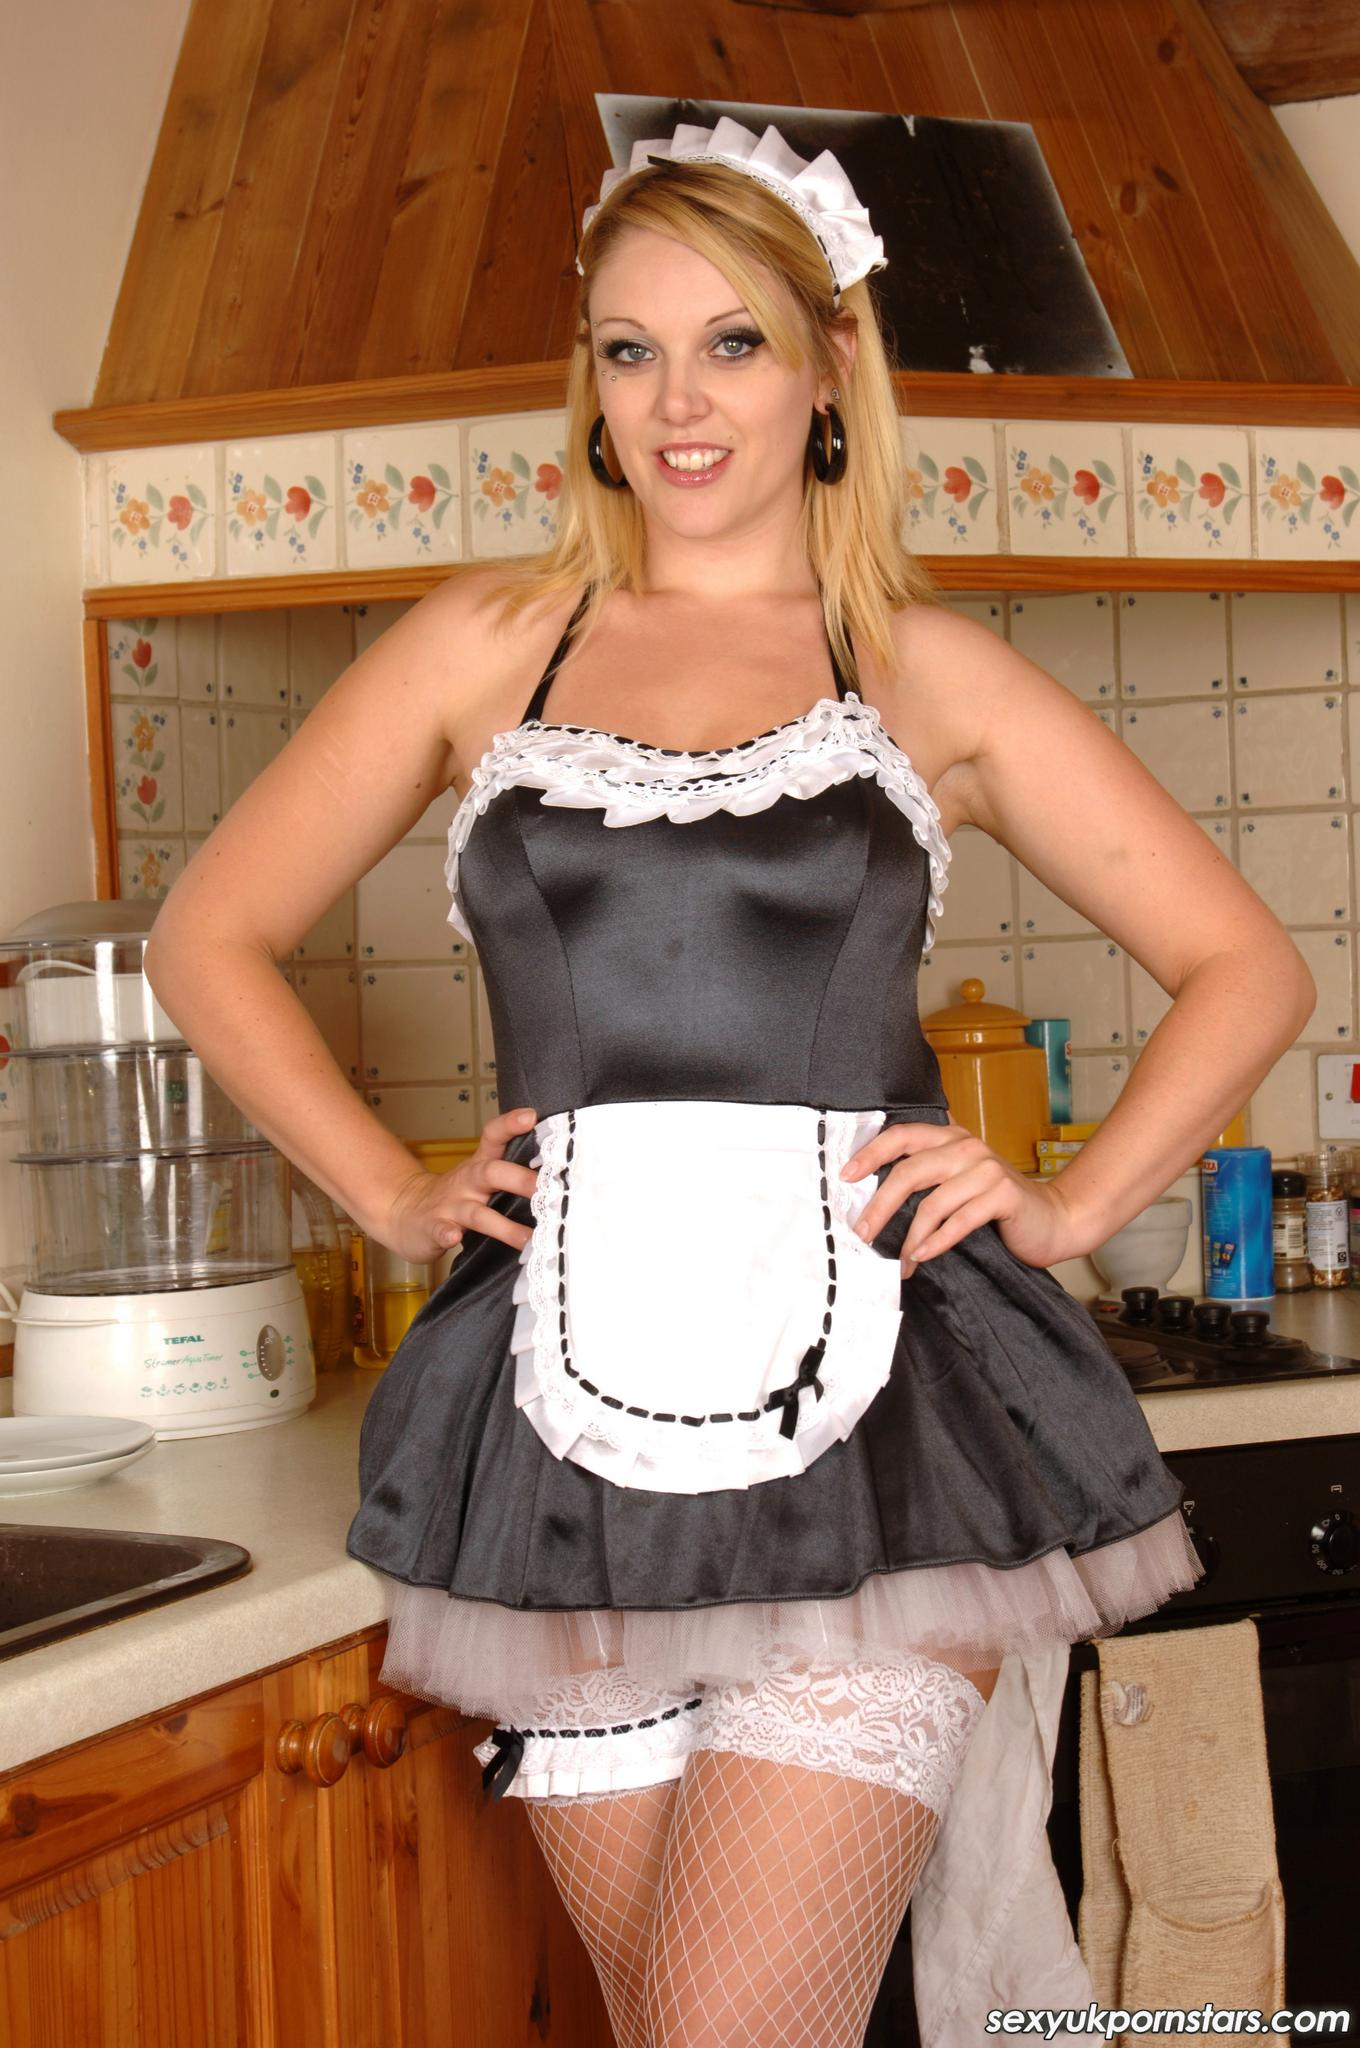 French maid pornstars